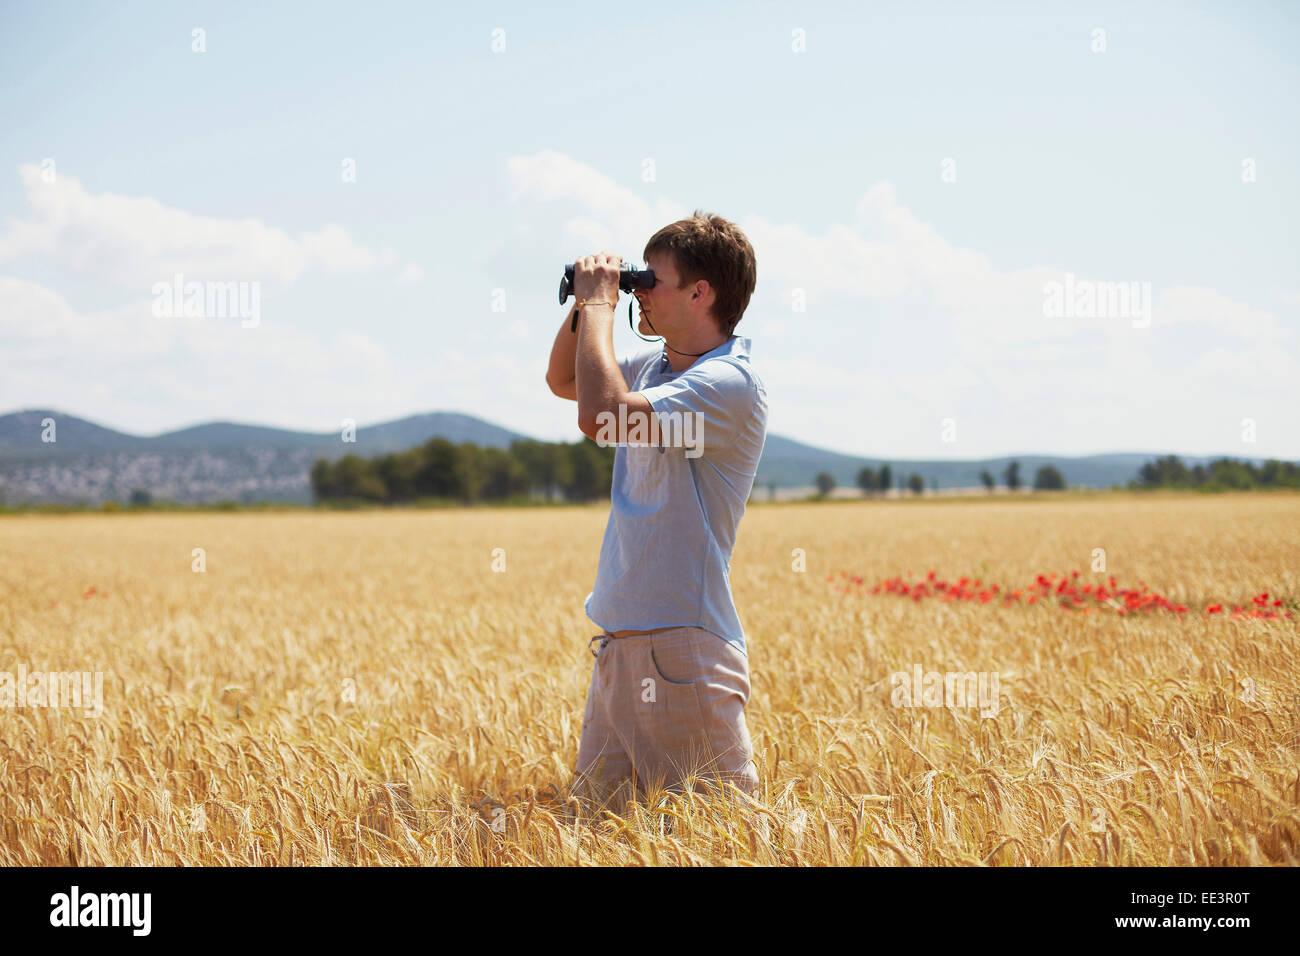 Man On Field Looking Through Binoculars, Croatia, Dalmatia, Europe Stock Photo